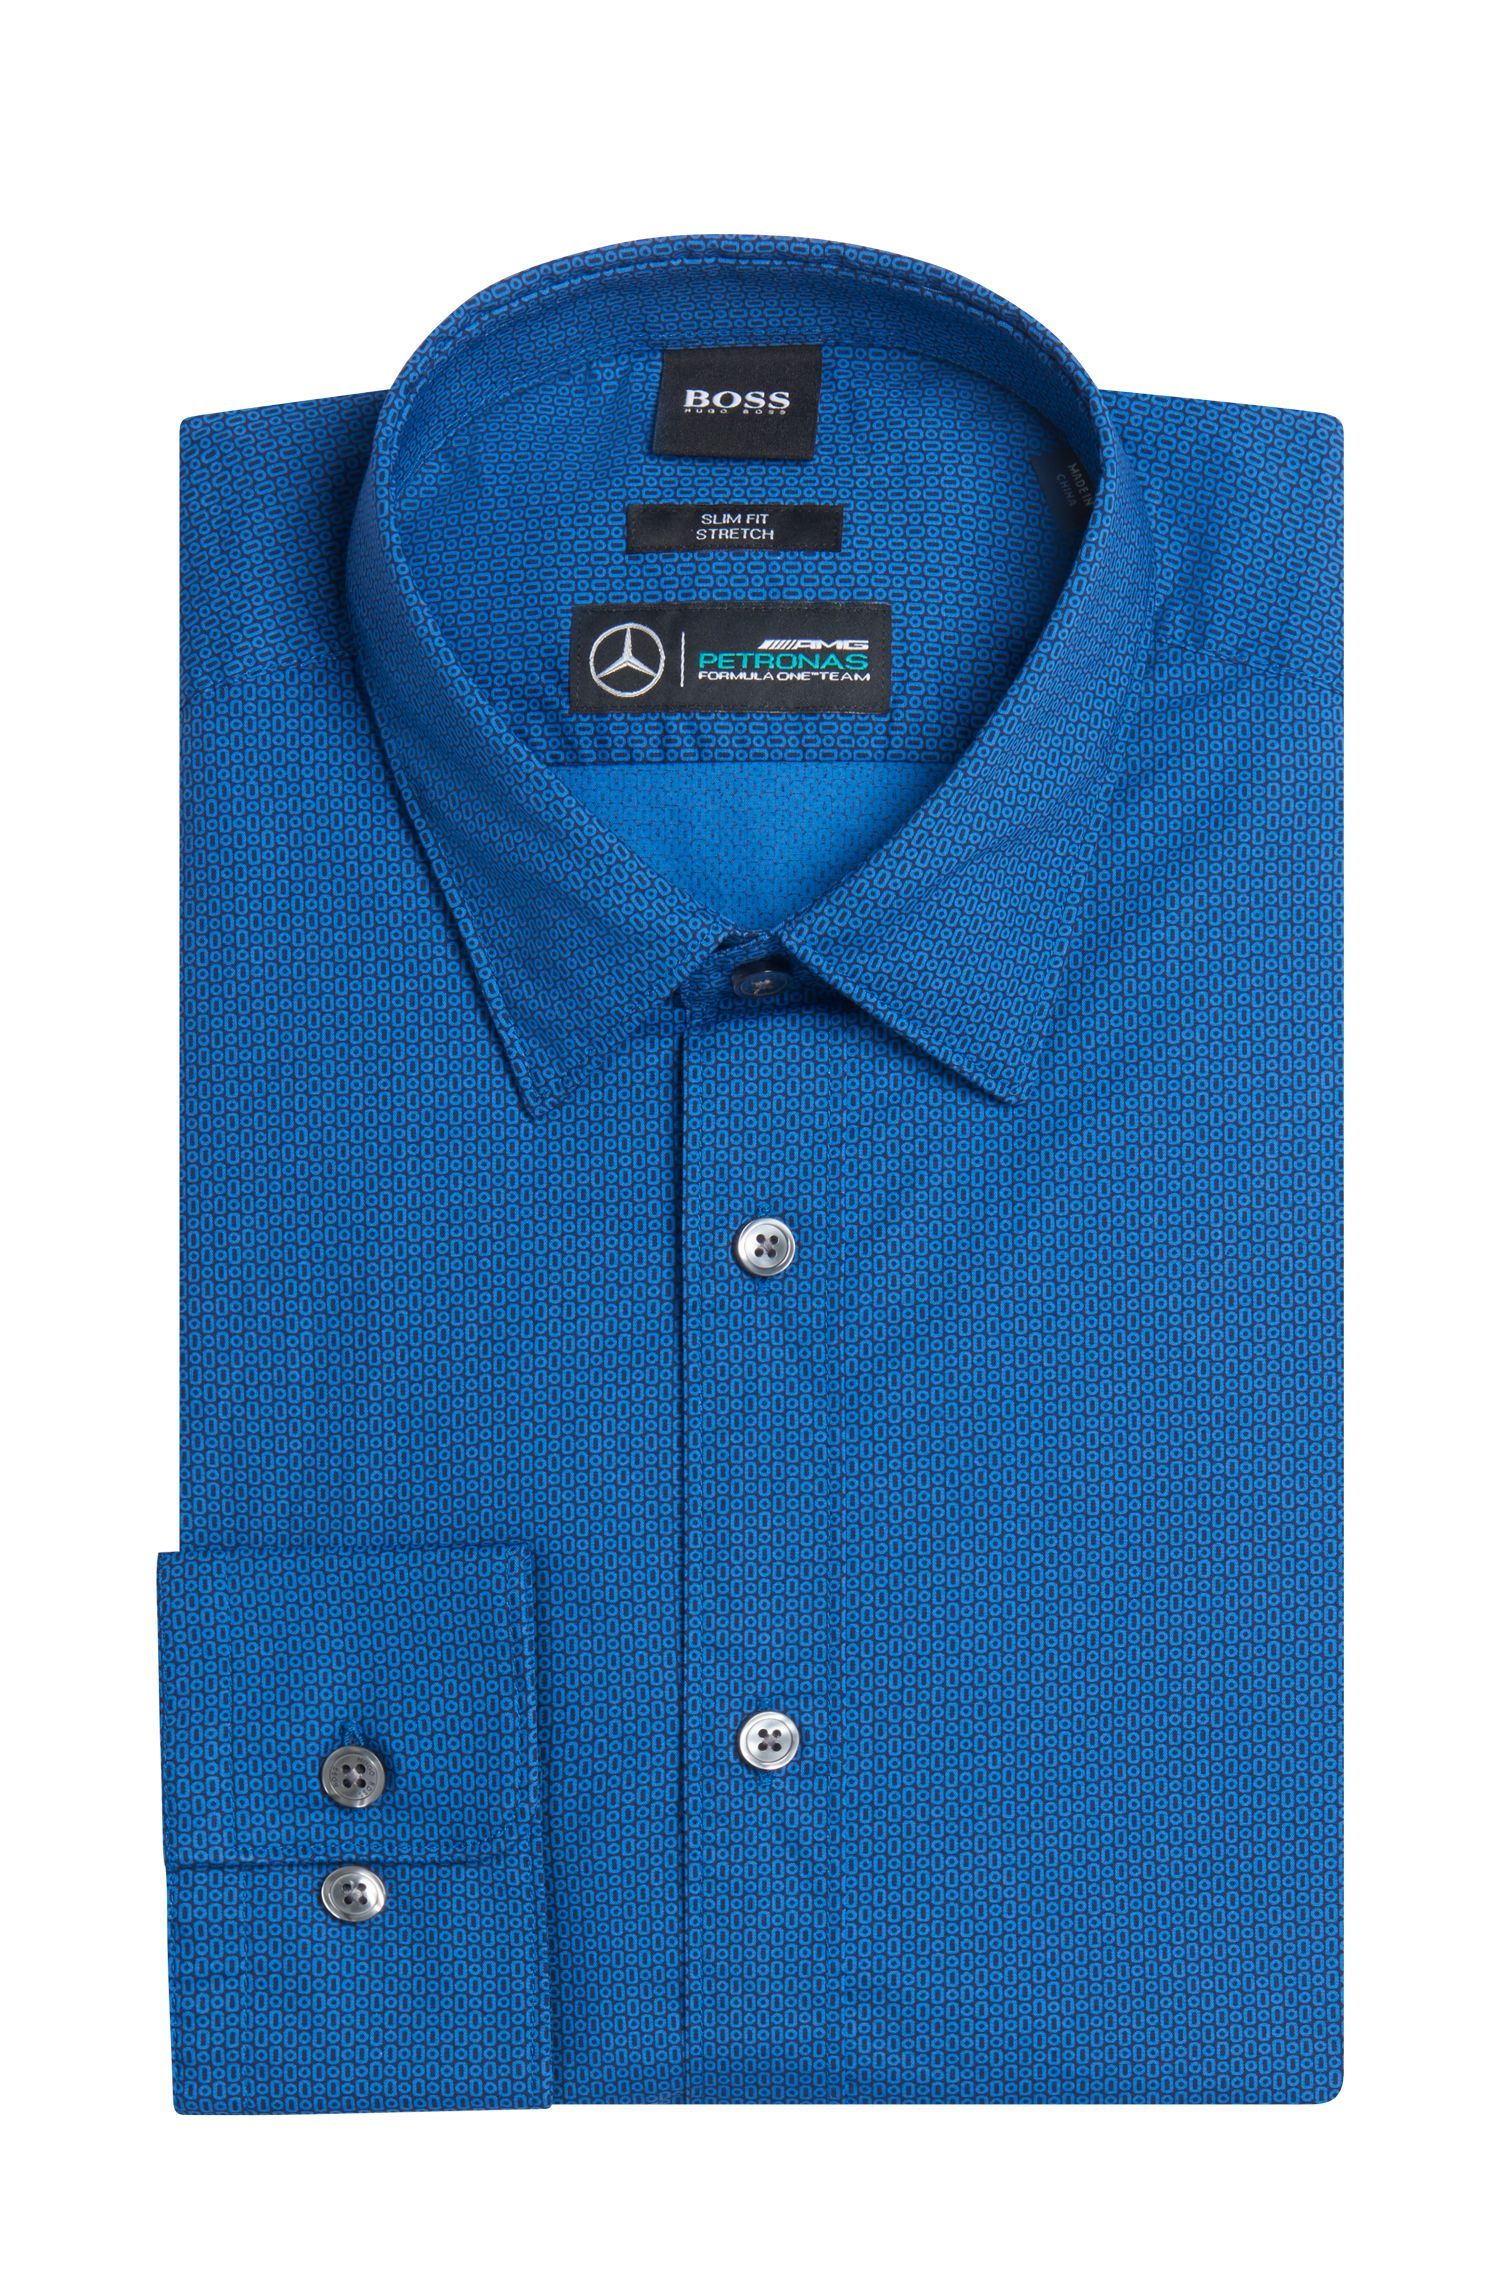 Mercedes-Benz Patterned Stretch Sport Shirt, Slim Fit | Reid